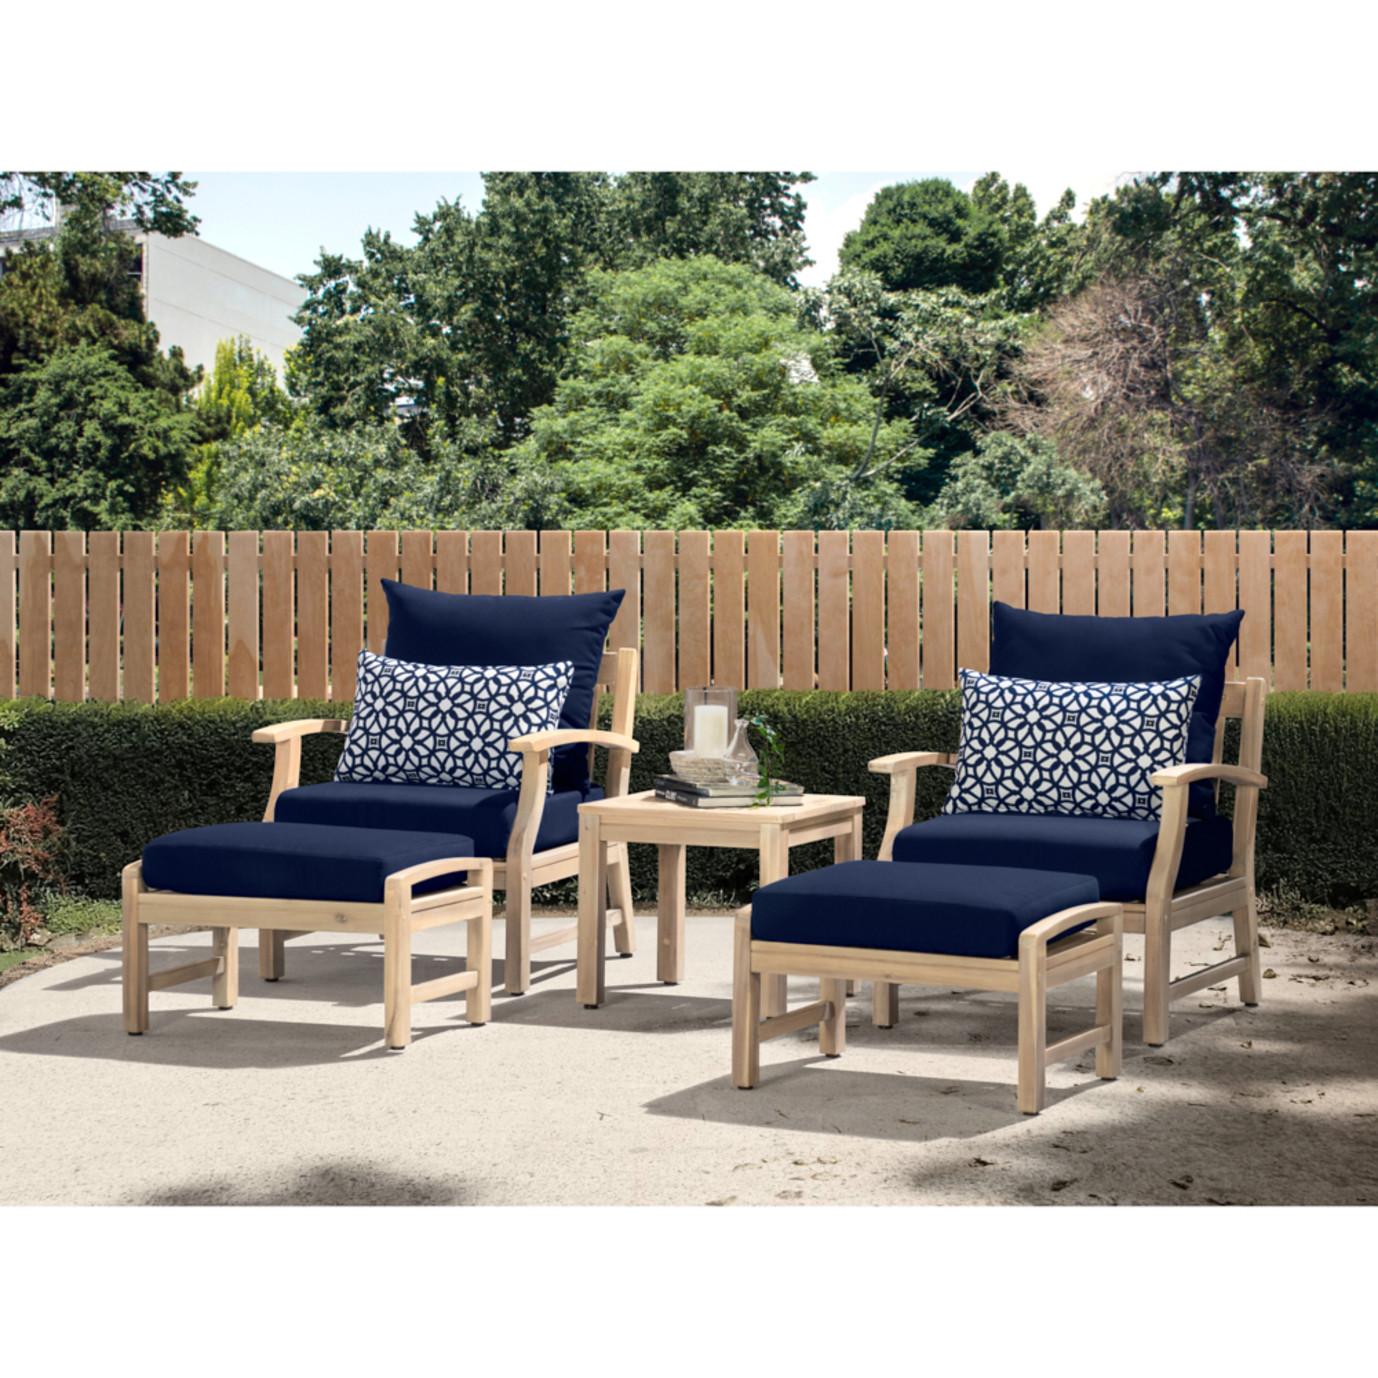 Kooper 5 Piece Club Chair & Ottoman Set - Navy Blue